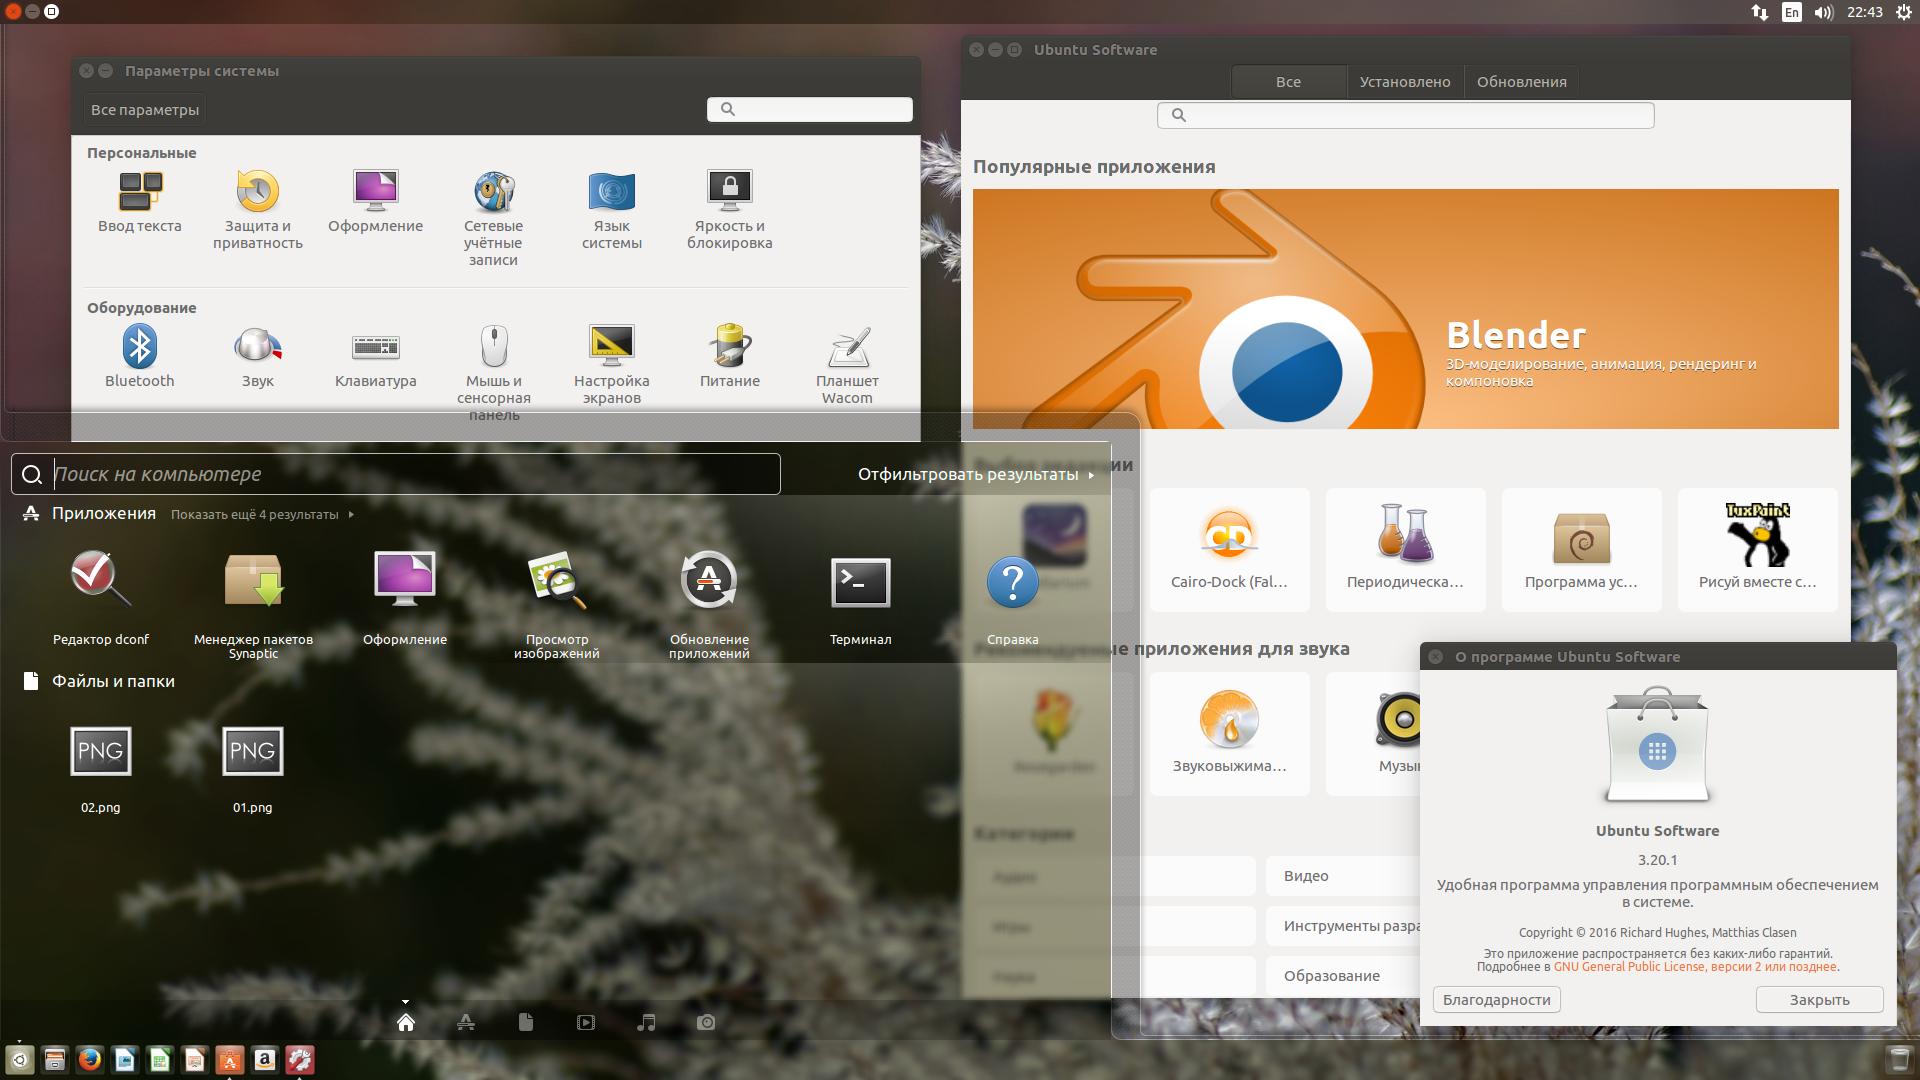 Ubuntu 16.04.6 LTS (Xenial Xerus)